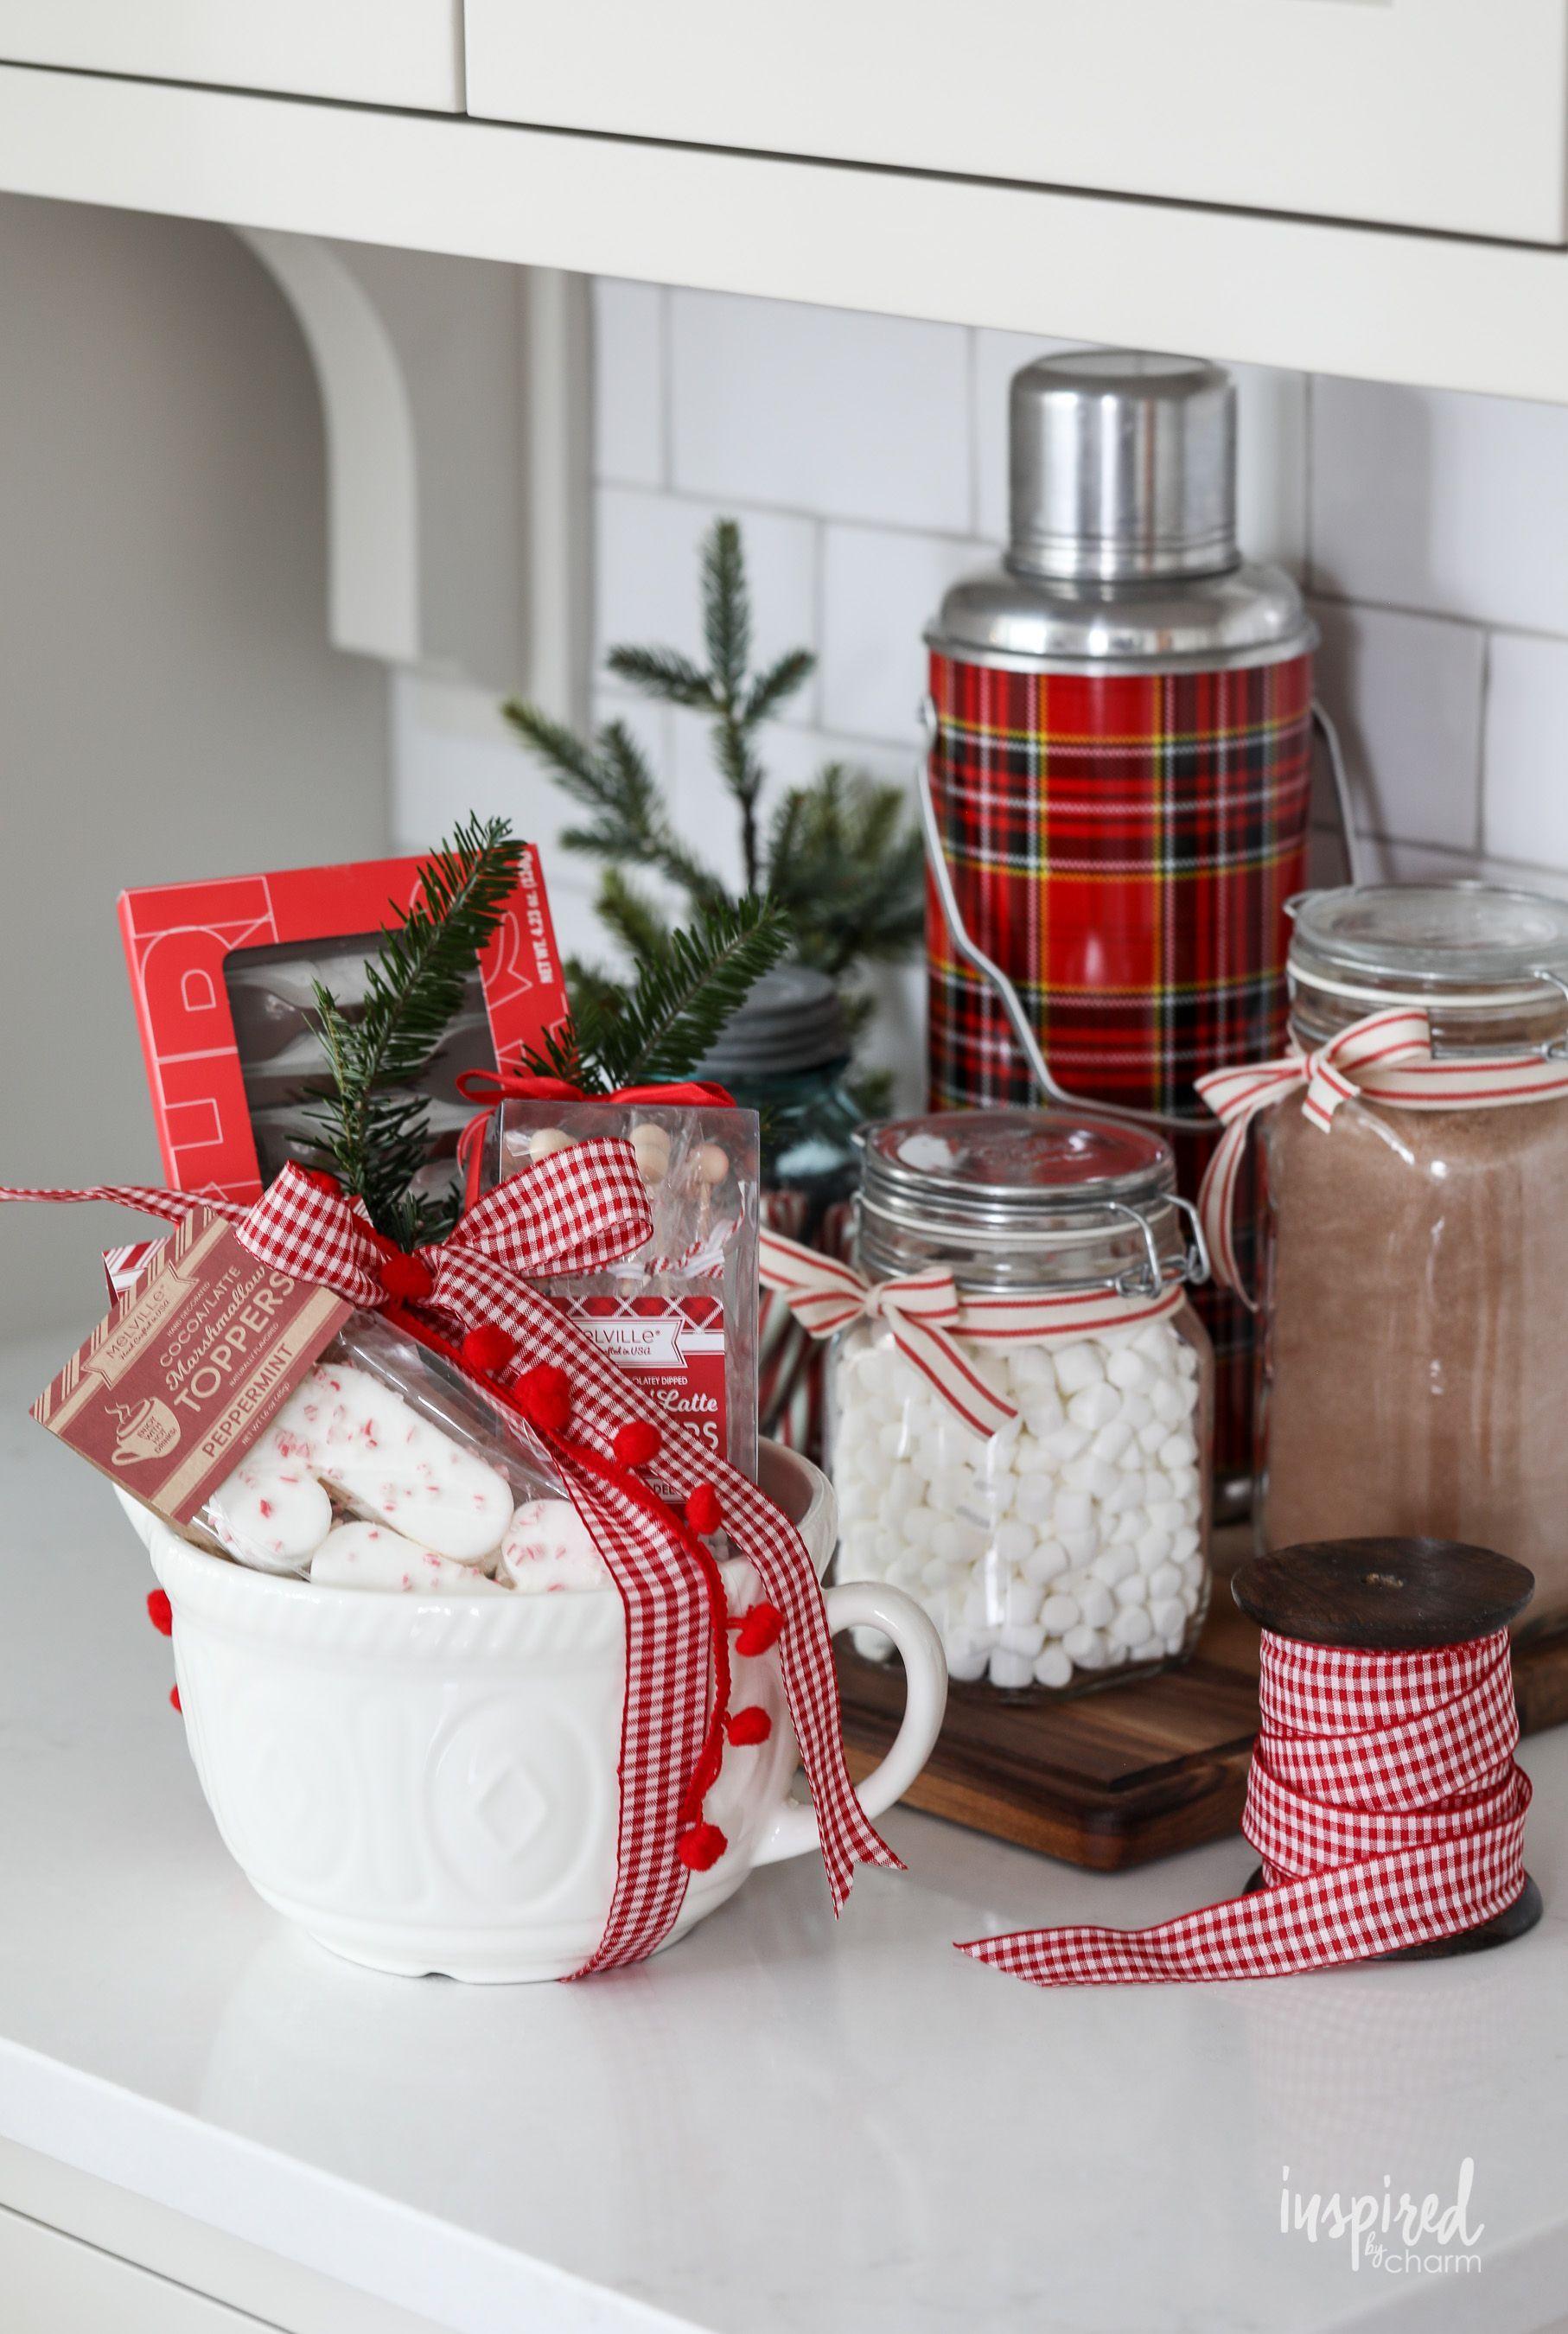 Creative Hostess / Secret Santa / Yankee Swap Gift Ideas - HomeGoods #secretsantaideas Creative Hostess / Secret Santa / Yankee Swap Gift Ideas - HomeGoods